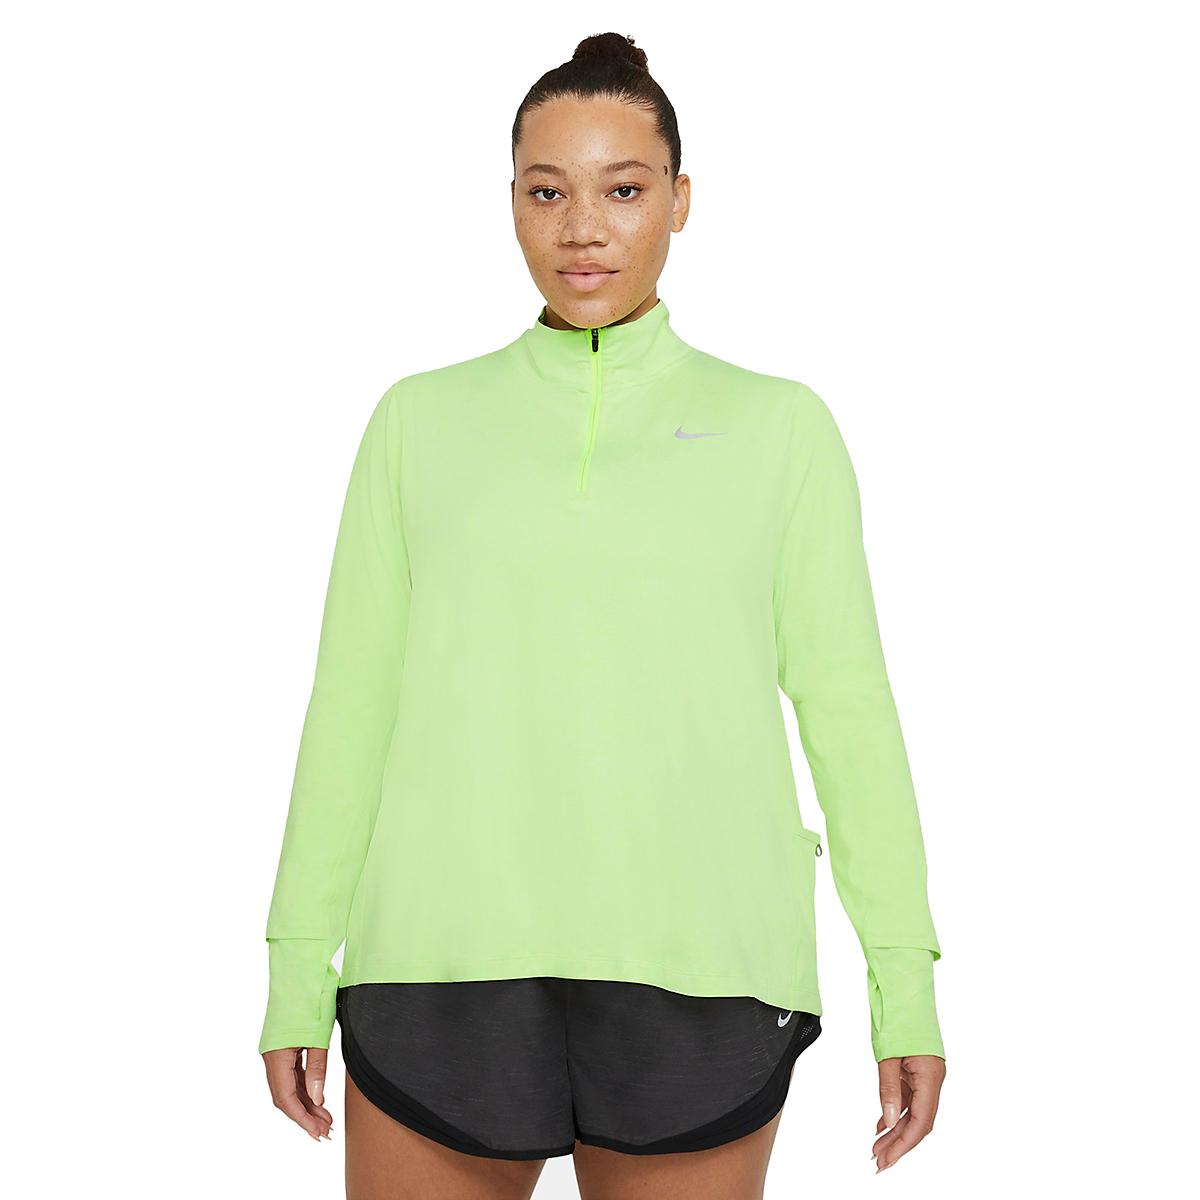 Women's Nike Element Top 1/2 Zip Long Sleeve - Color: Volt/Barely Volt/Htr/Reflective Silver - Size: XS, Volt/Barely Volt/Htr/Reflective Silver, large, image 2